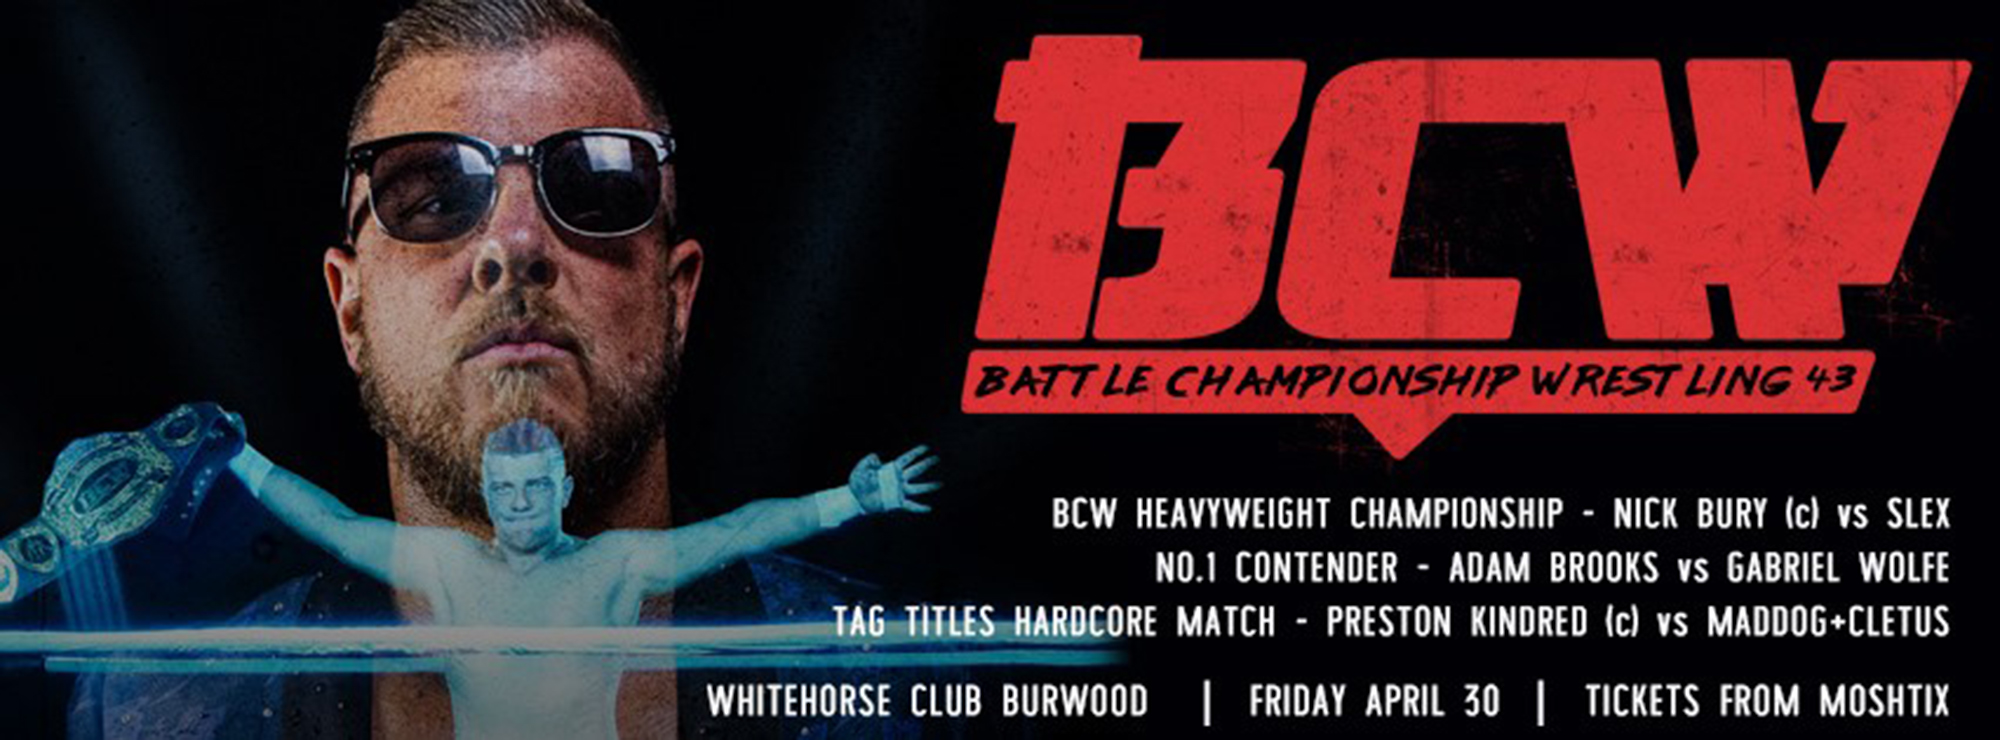 Battle Championship Wrestling